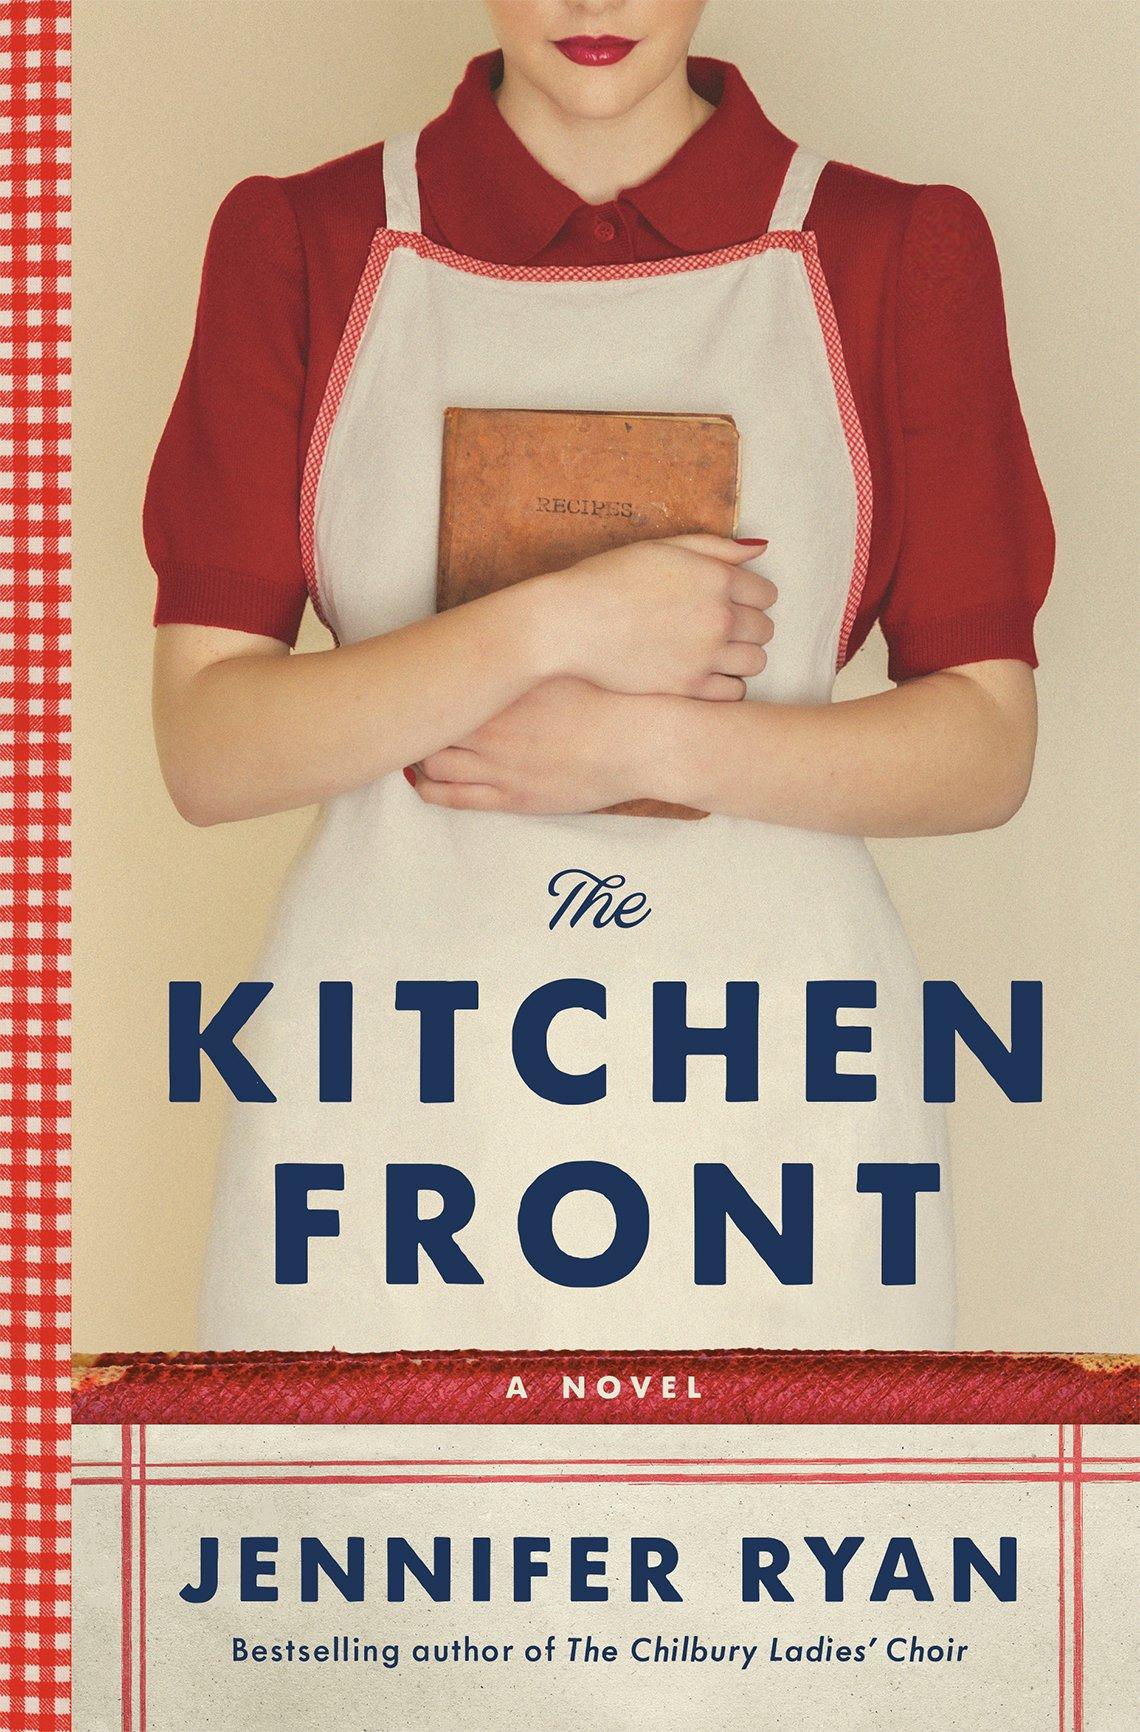 Portada del libro The Kitchen Front de Jennifer Ryan.